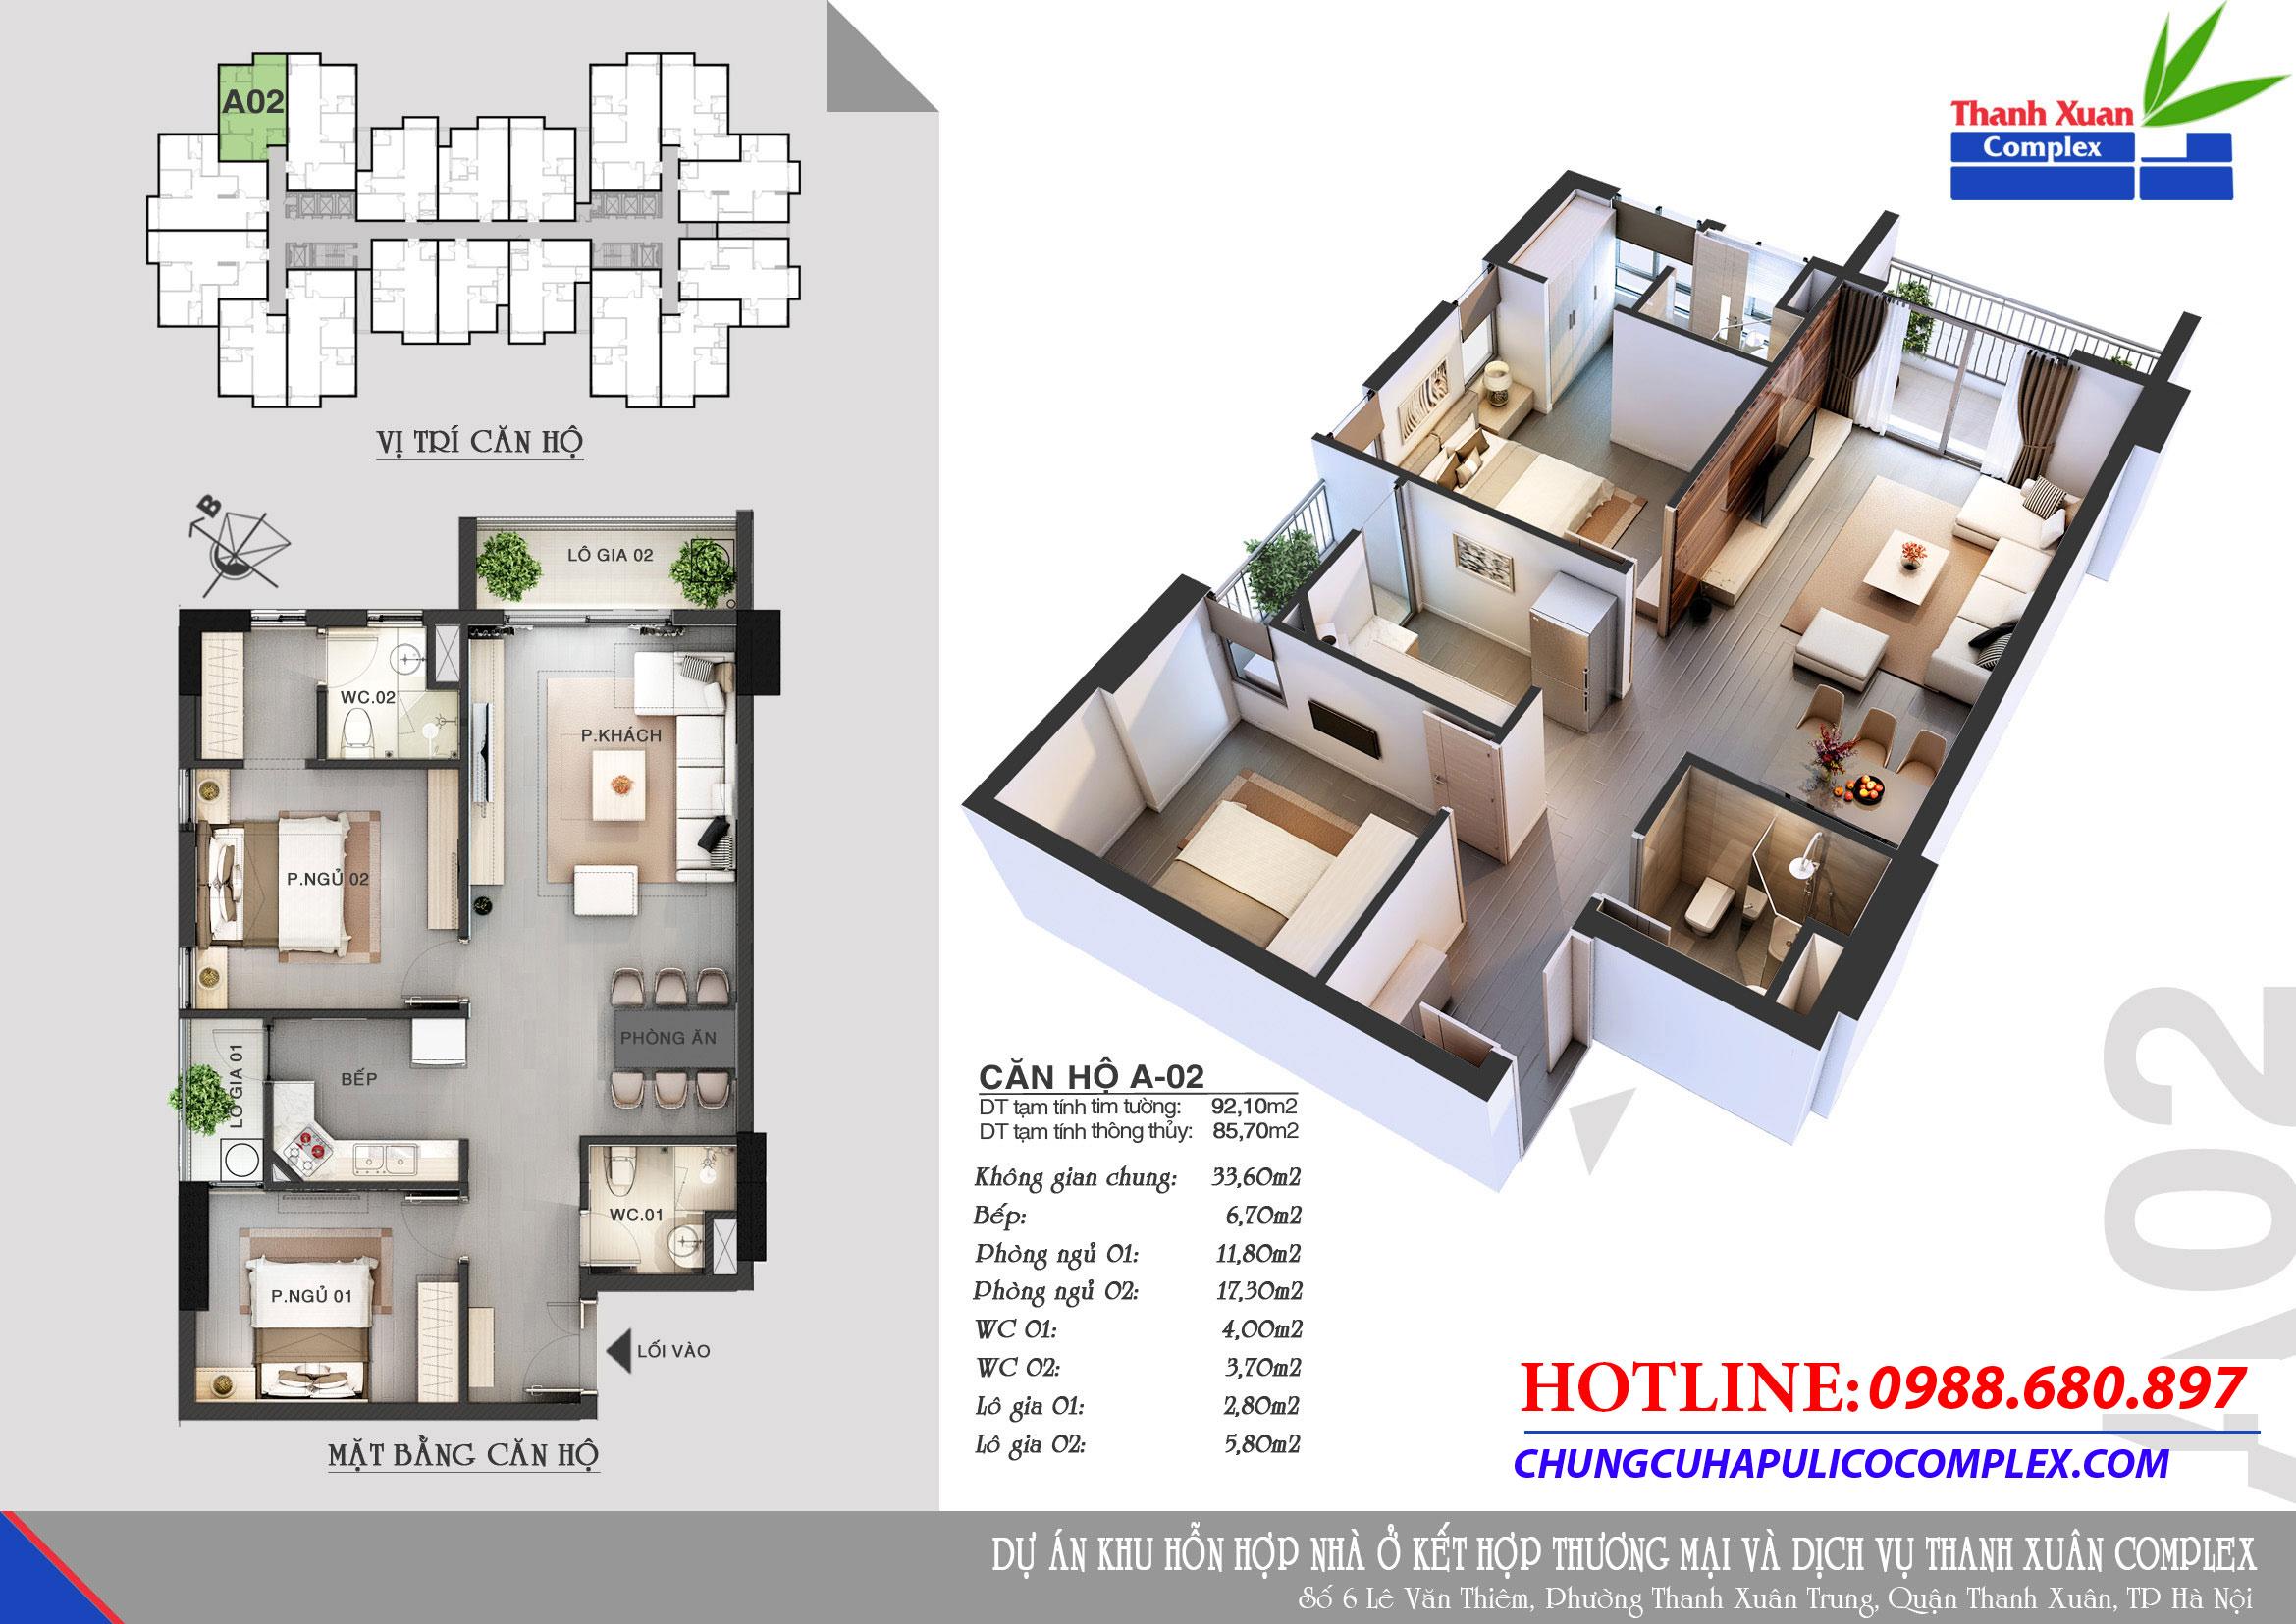 HSB_Thanhxuan-complex_CH-A02_suachotT42016-copy